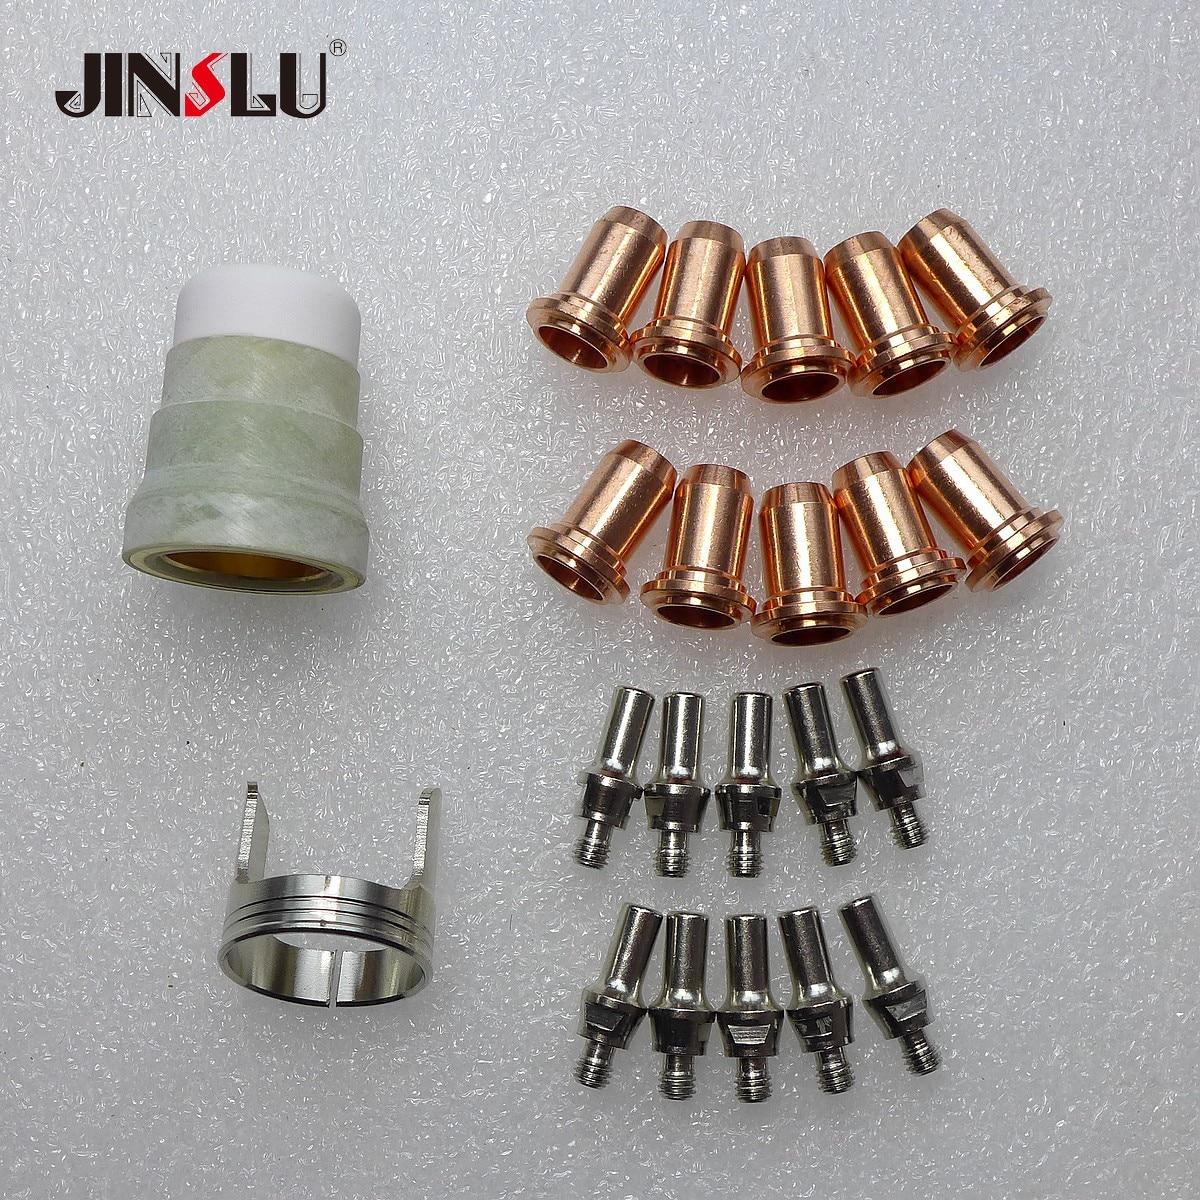 Kit de electrodos de punta para boquilla aptos para electrodo de punta para boquilla aptos para FUBAG PLASMA 65 T 68 443,1 PB P60 soplete cortador de Plasma SKYRC T200 Balance cargador 12A 100W Dual XT60 enchufe 10W descargador para LiHV LiPo Li-ion vida NiMH NiCD Pb batería AGM frío modos